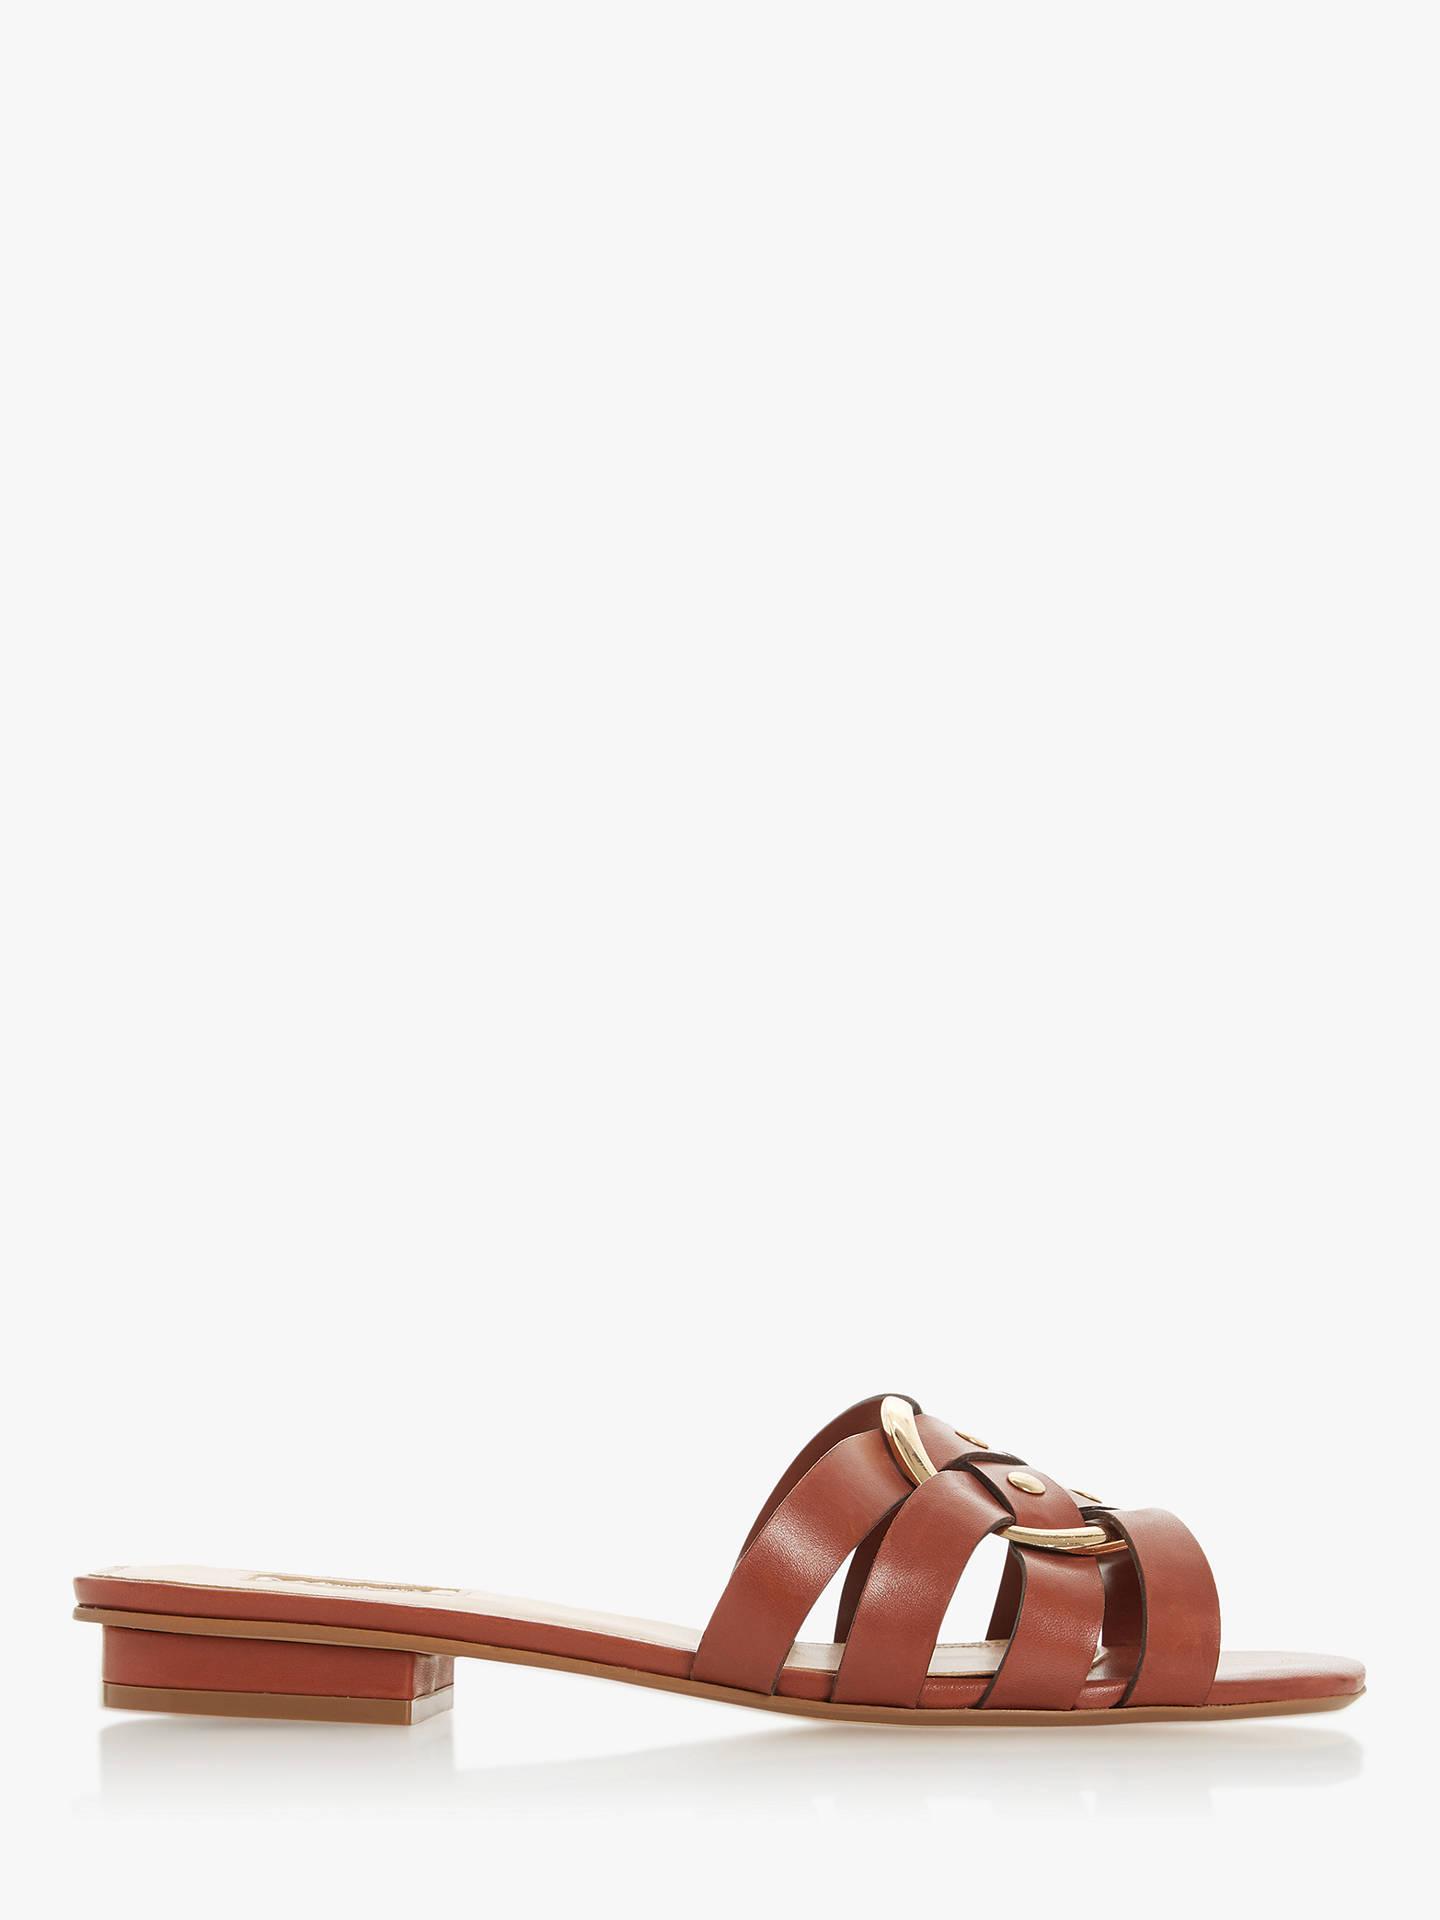 49ee8639 Dune Logan Flat Slip-On Leather Sandals at John Lewis & Partners